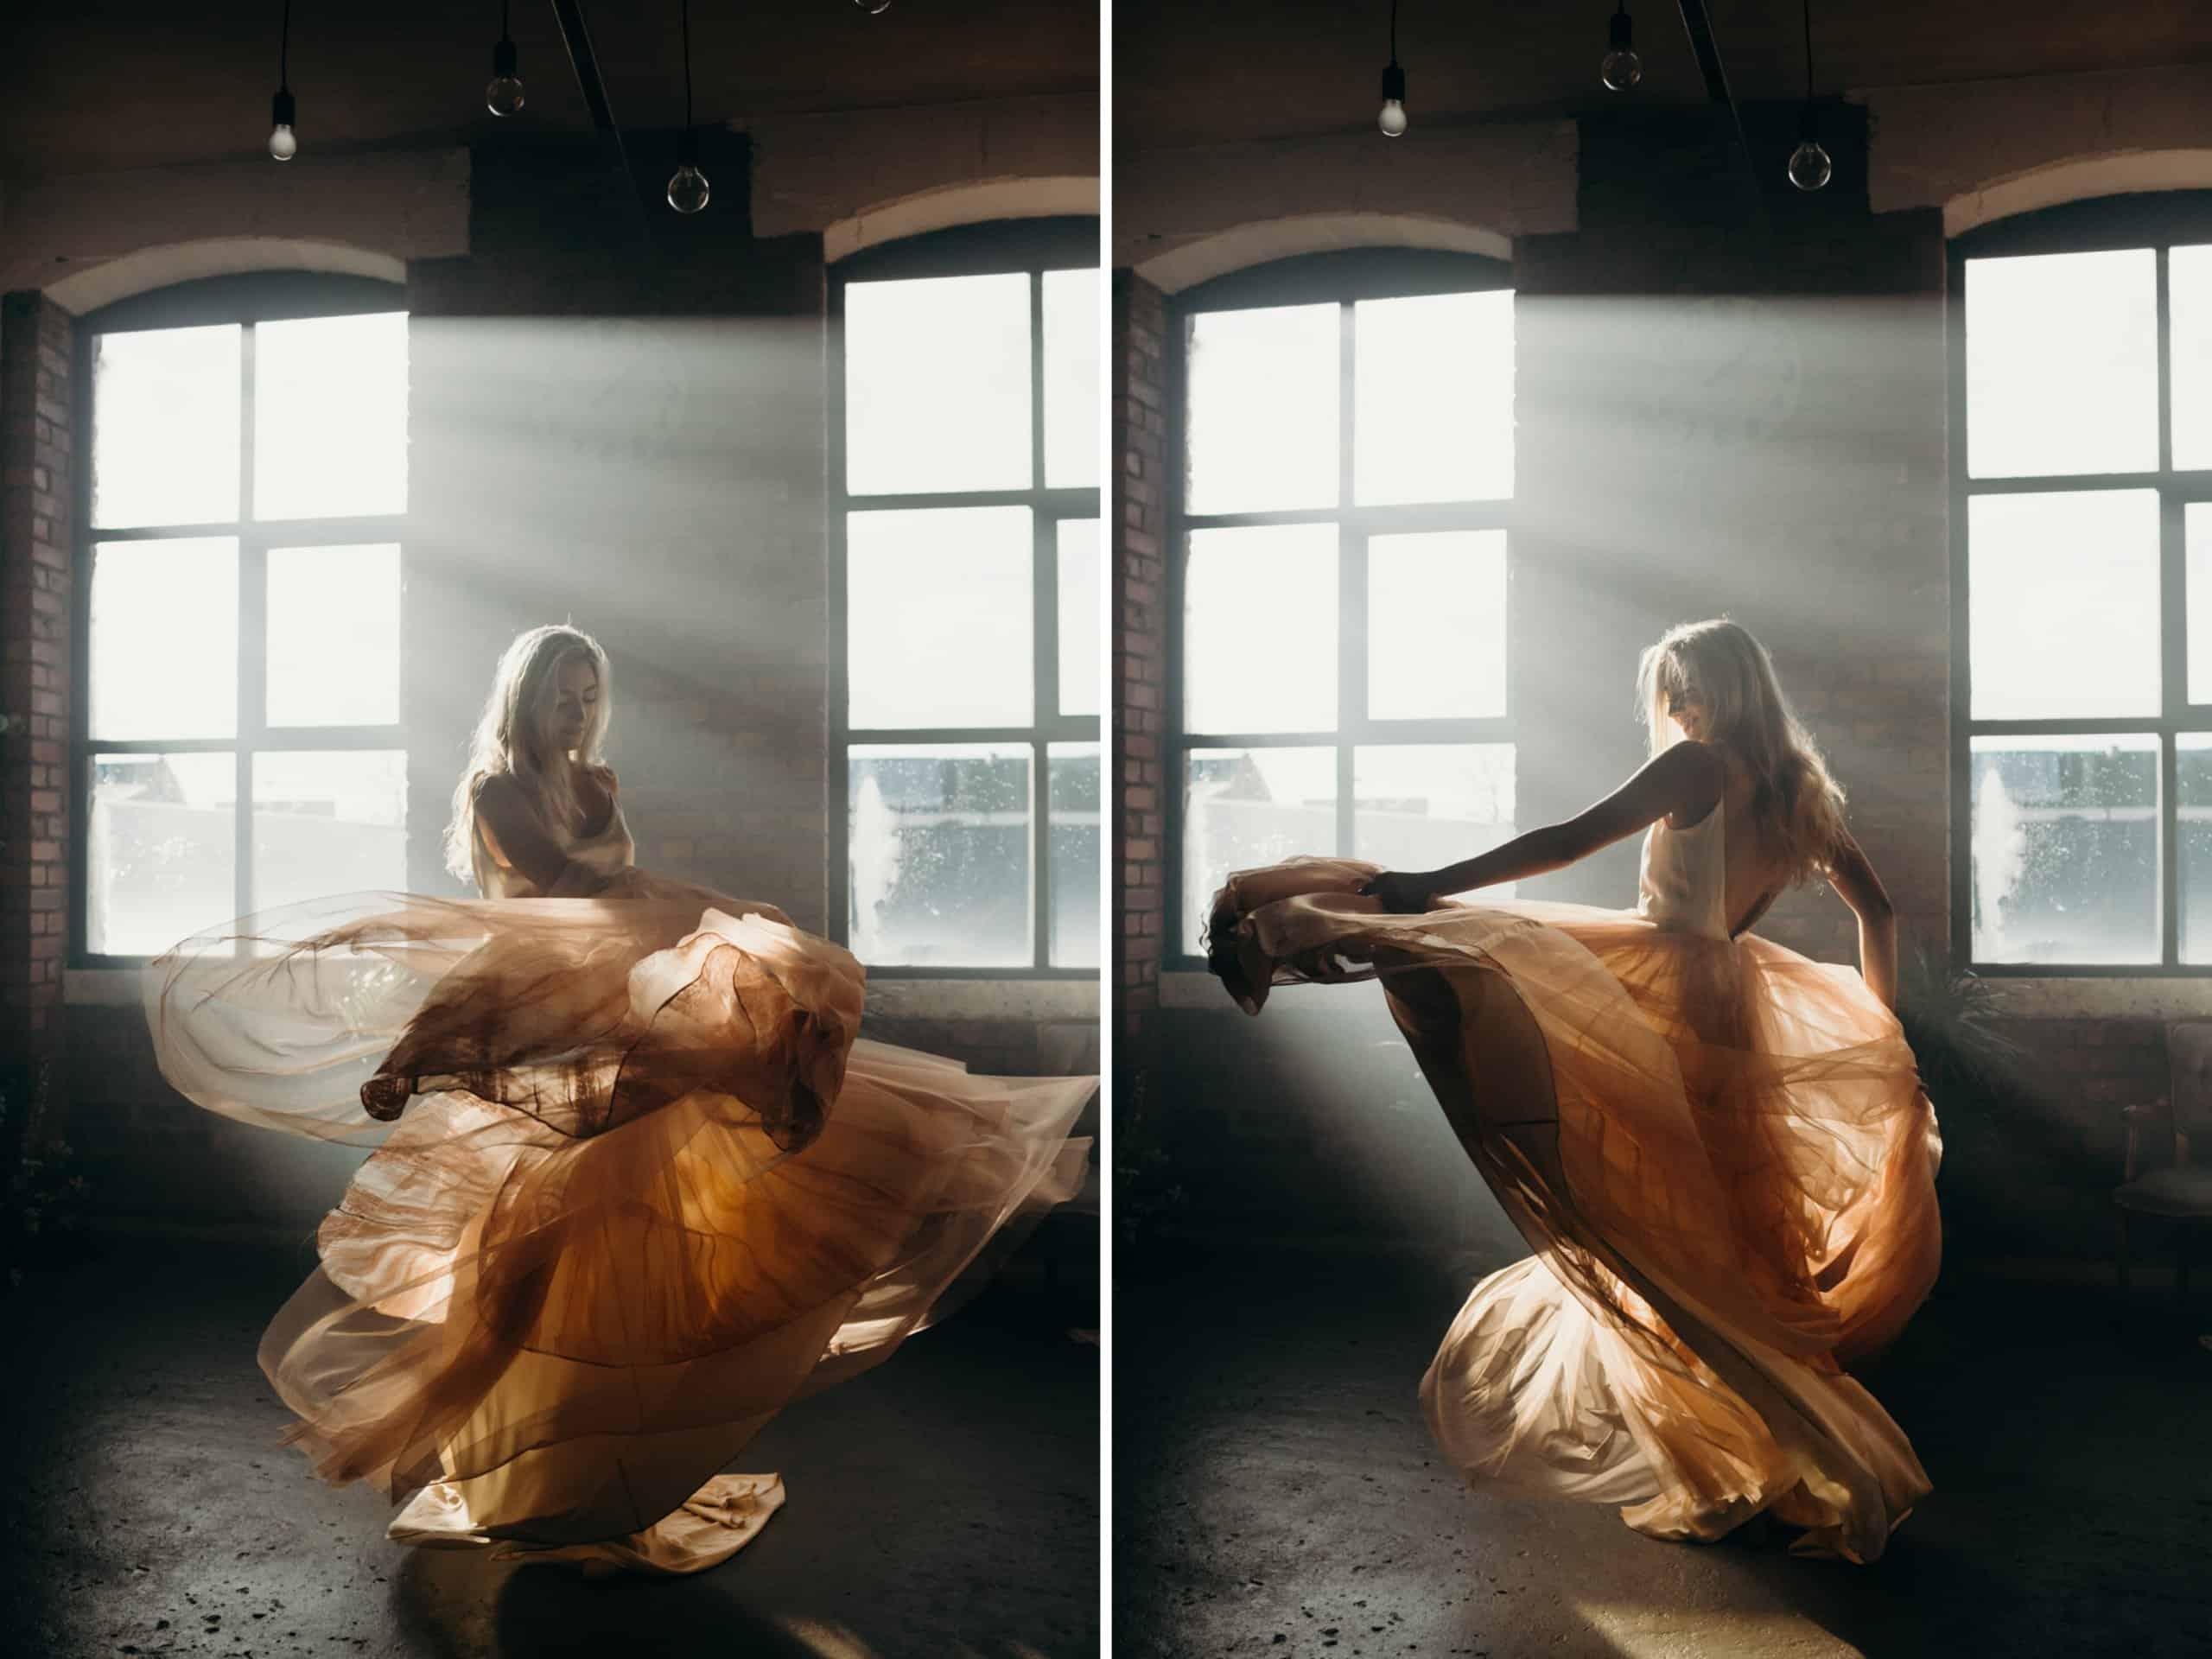 wedding dress girl twirling